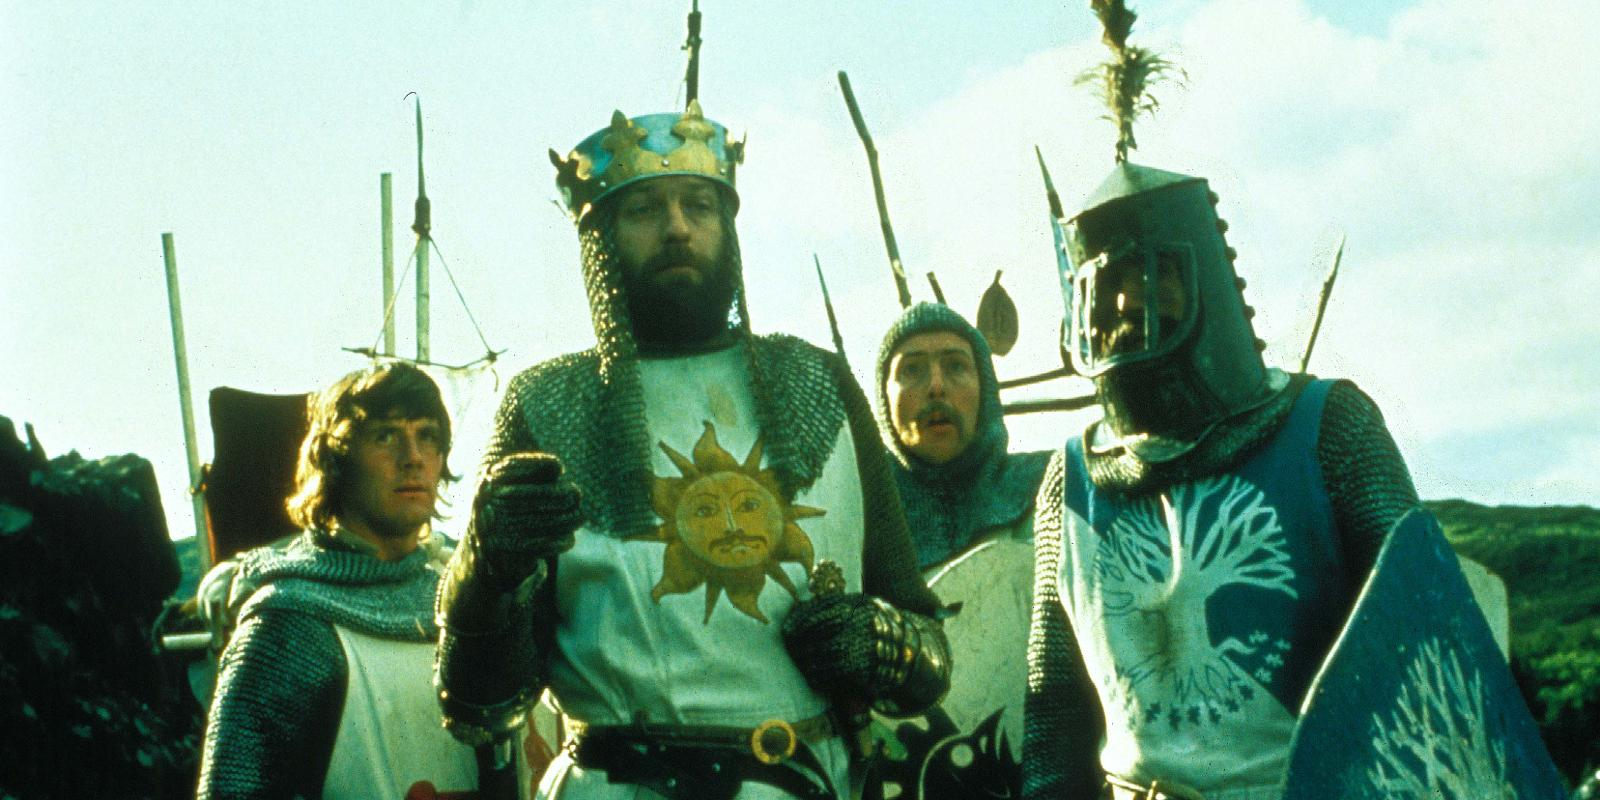 king arthur essay who was the real king arthur essay mfacourses web fc com who was the real king